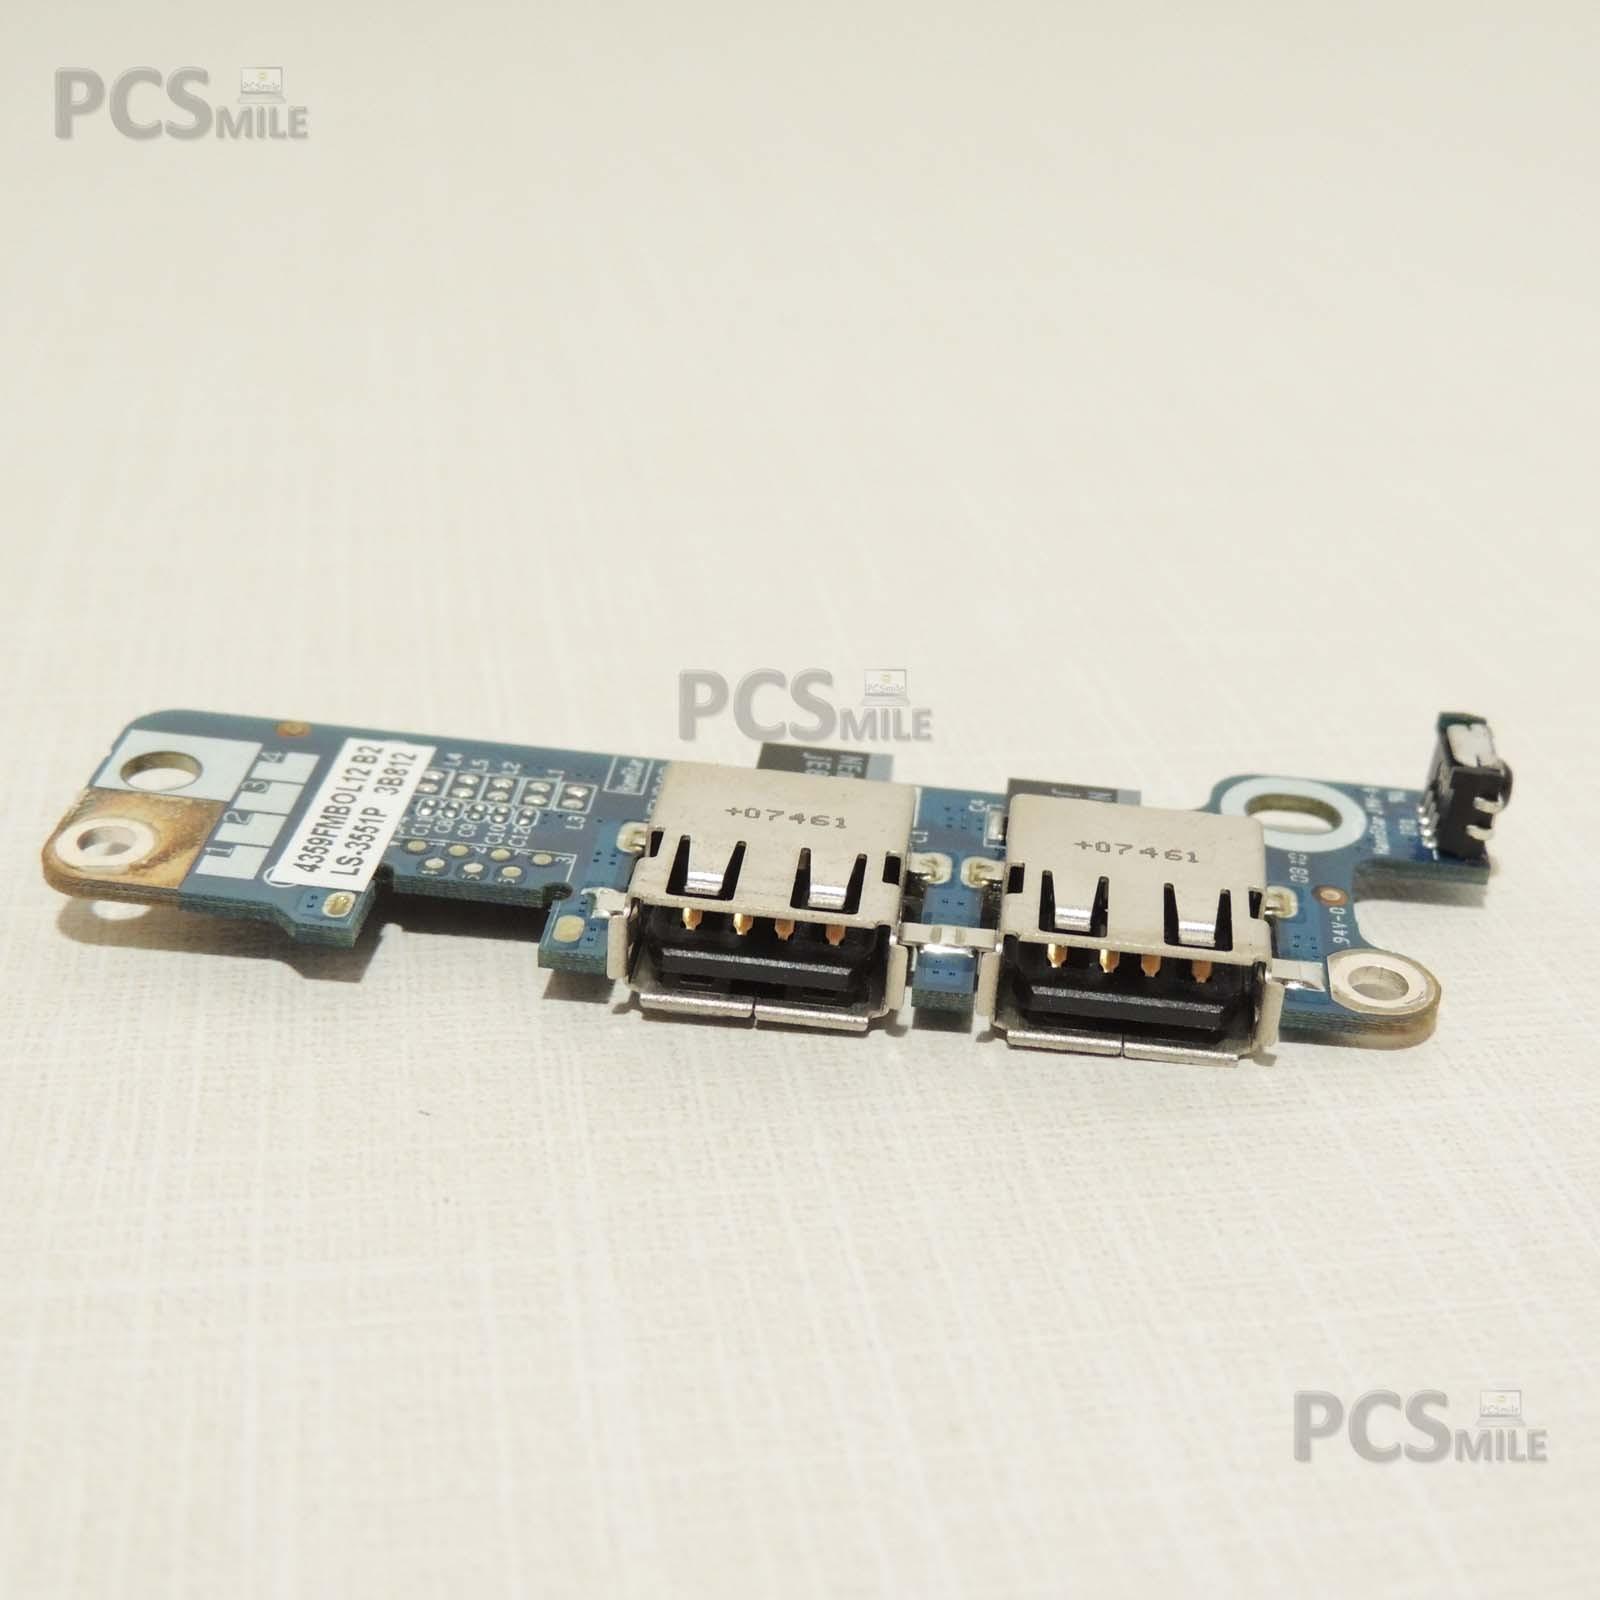 Porte USB Board Acer Aspire 7520 Series ICL50 LS-3551P